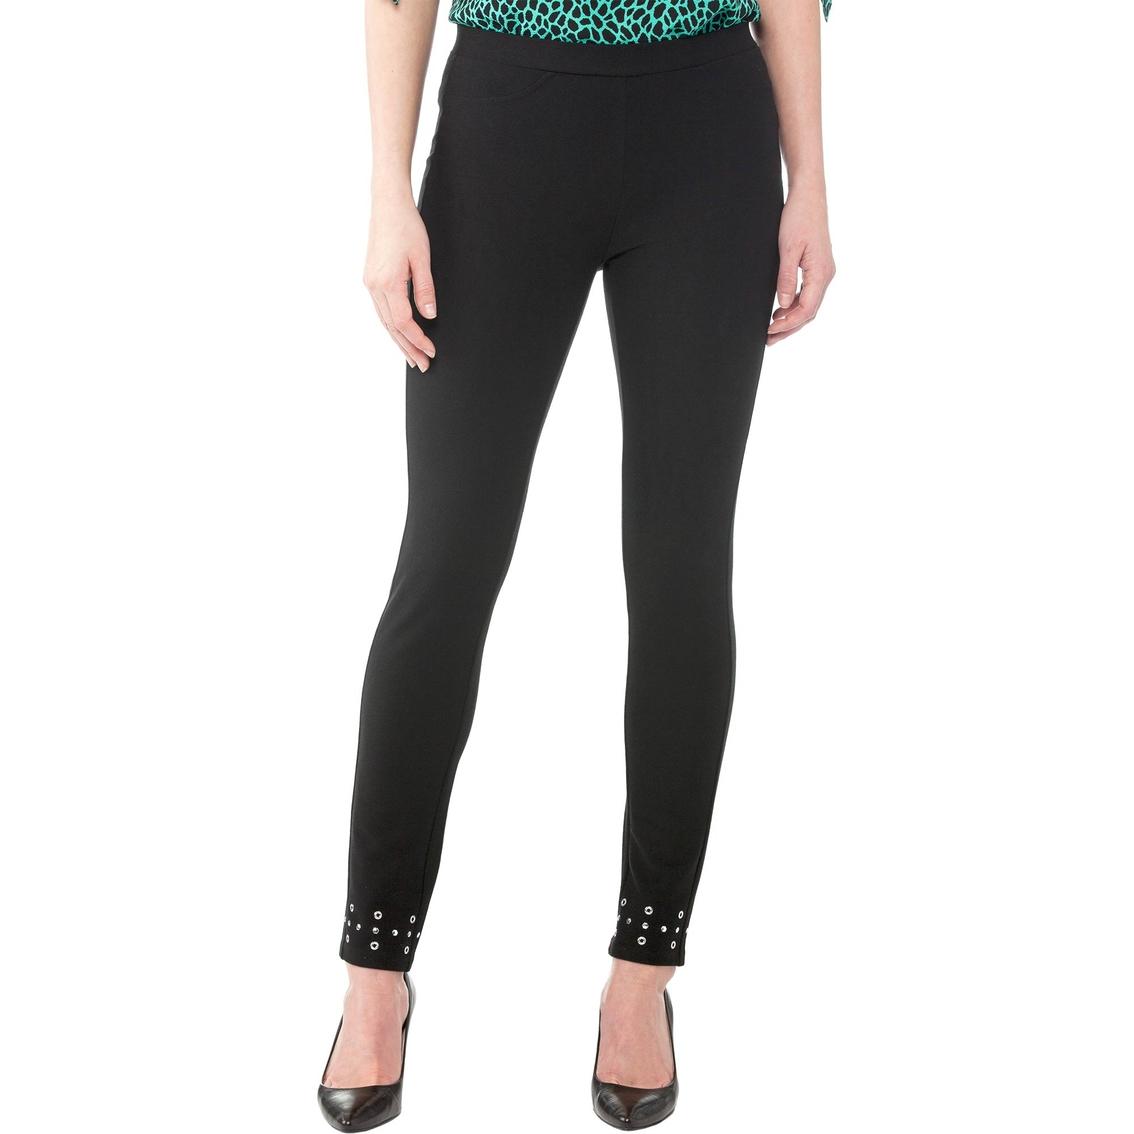 9b5292e22ab41 Michael Kors Petite Embellished Leggings | Apparel | Shop The Exchange